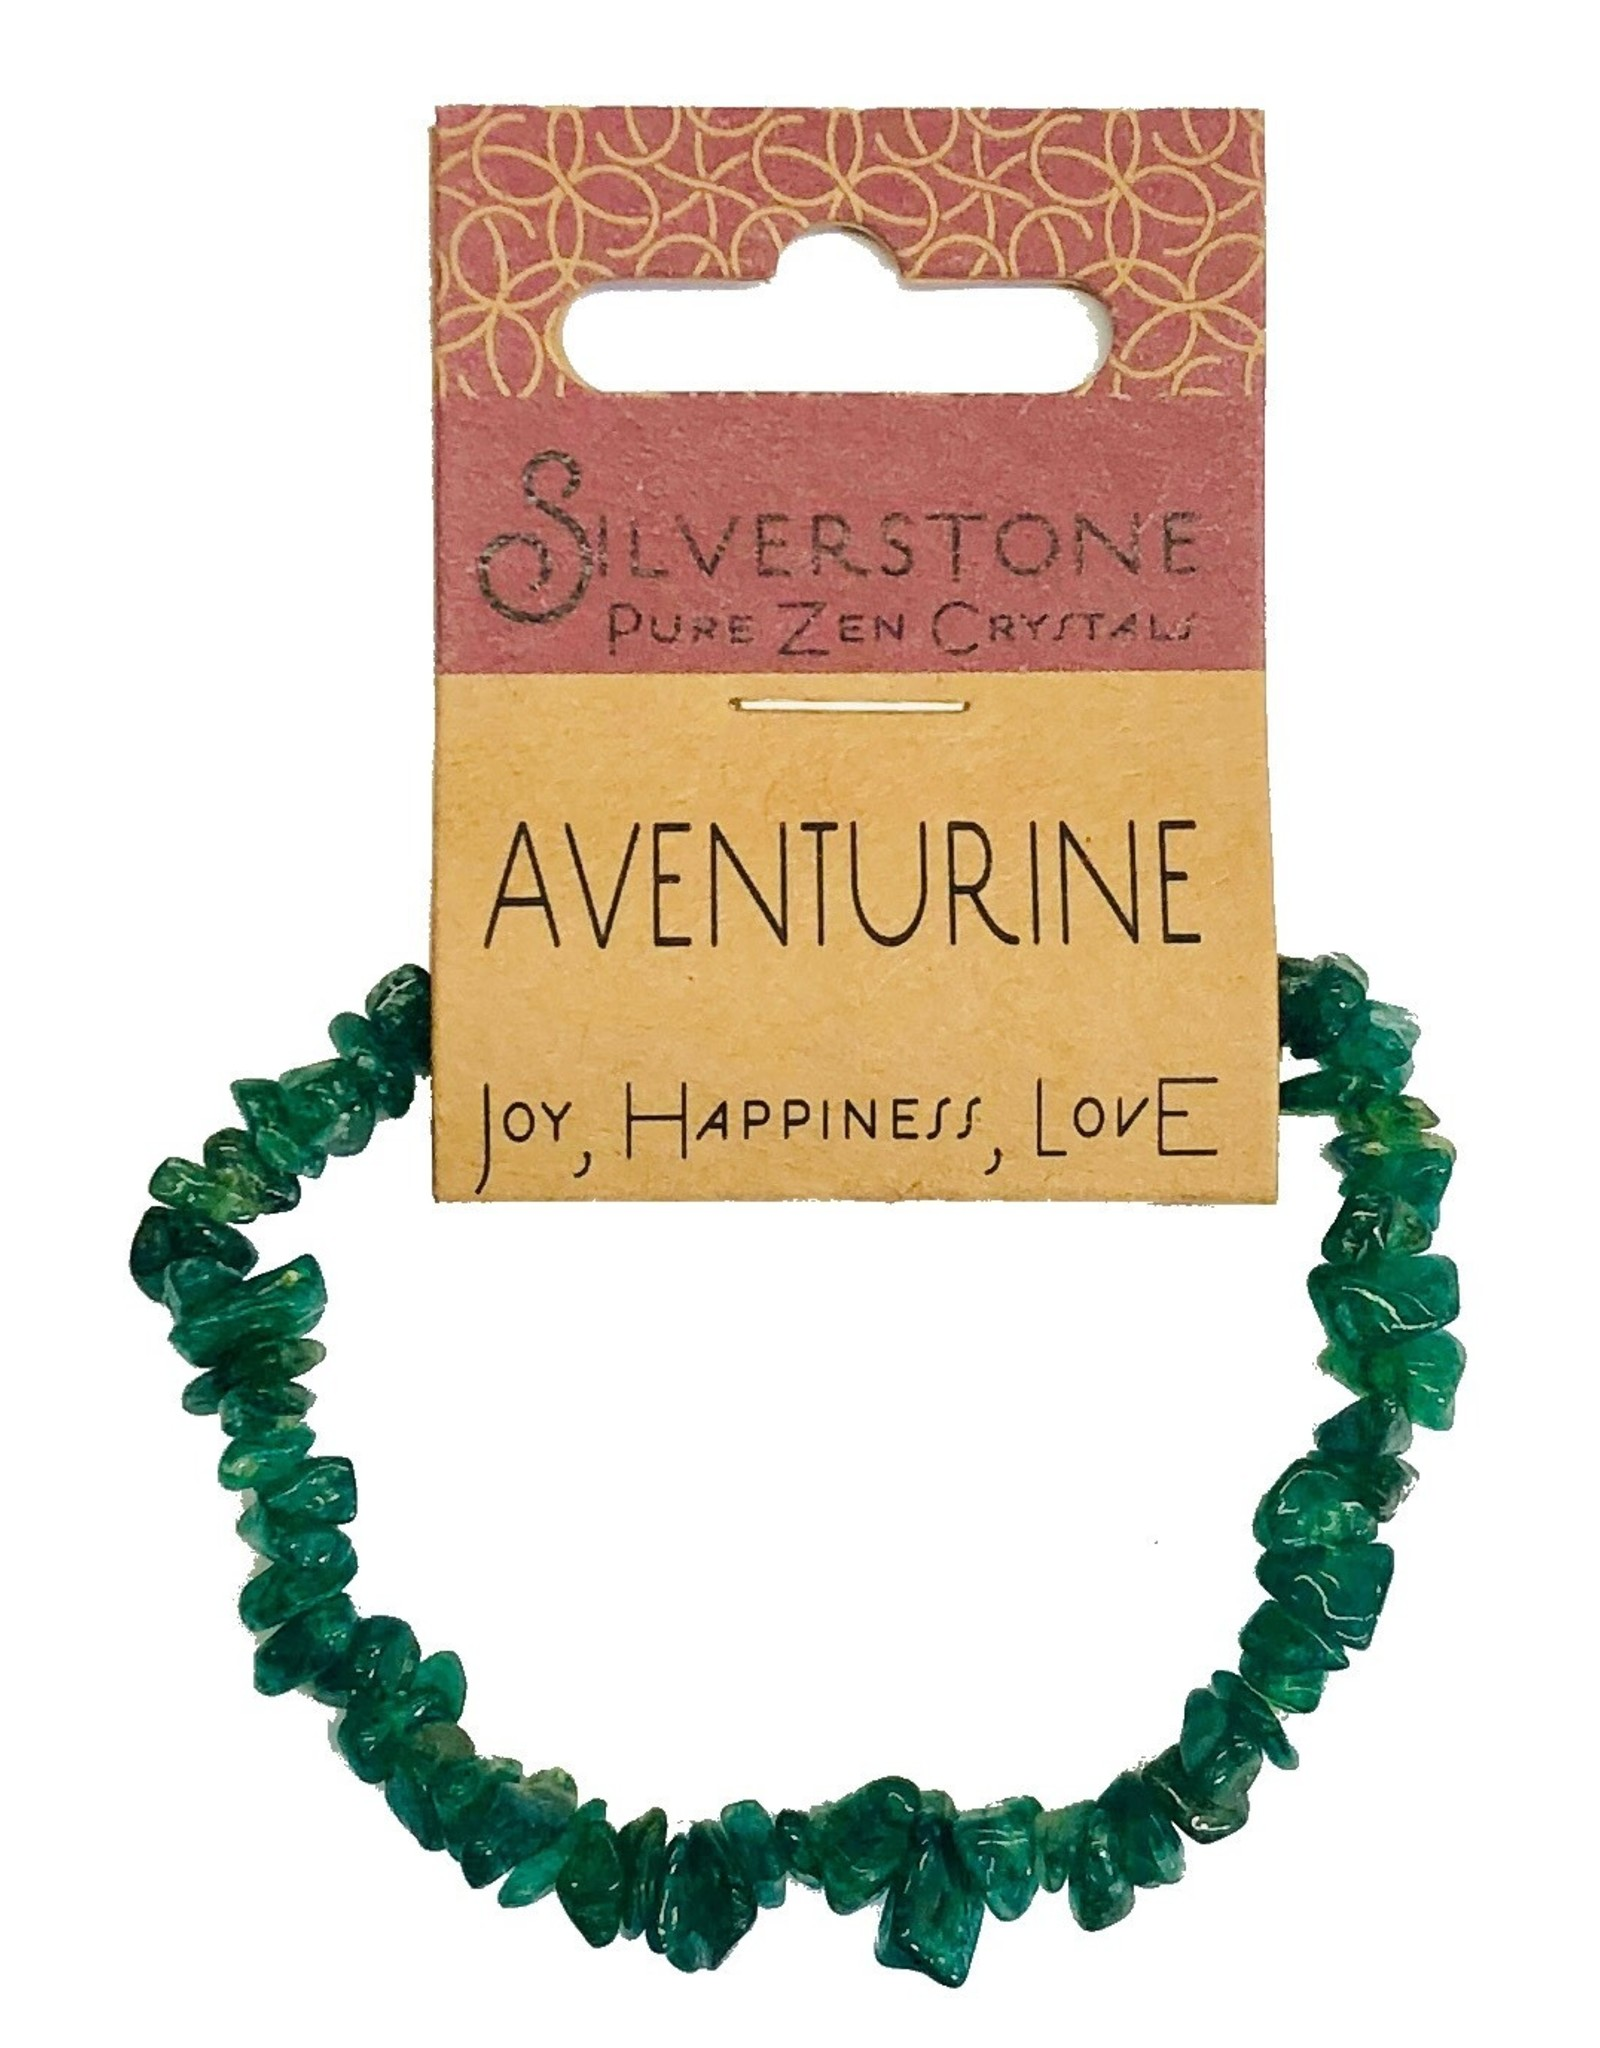 Silverstone Crystal Chip Bracelet - Aventurine - Eco Range